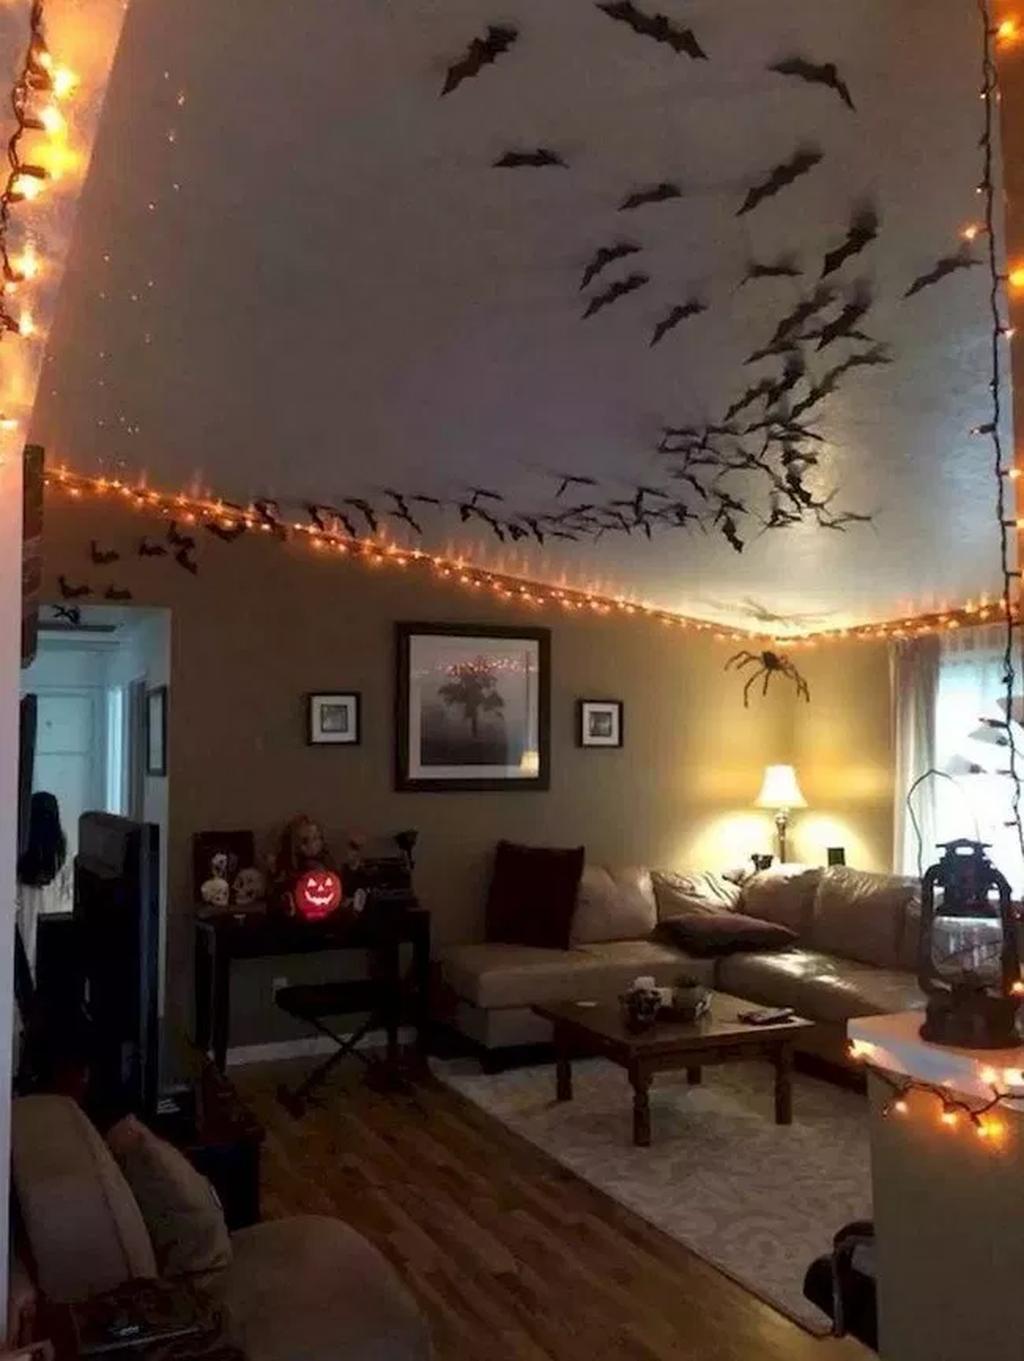 Amazing Bedroom Decoration Ideas With Halloween Theme 11